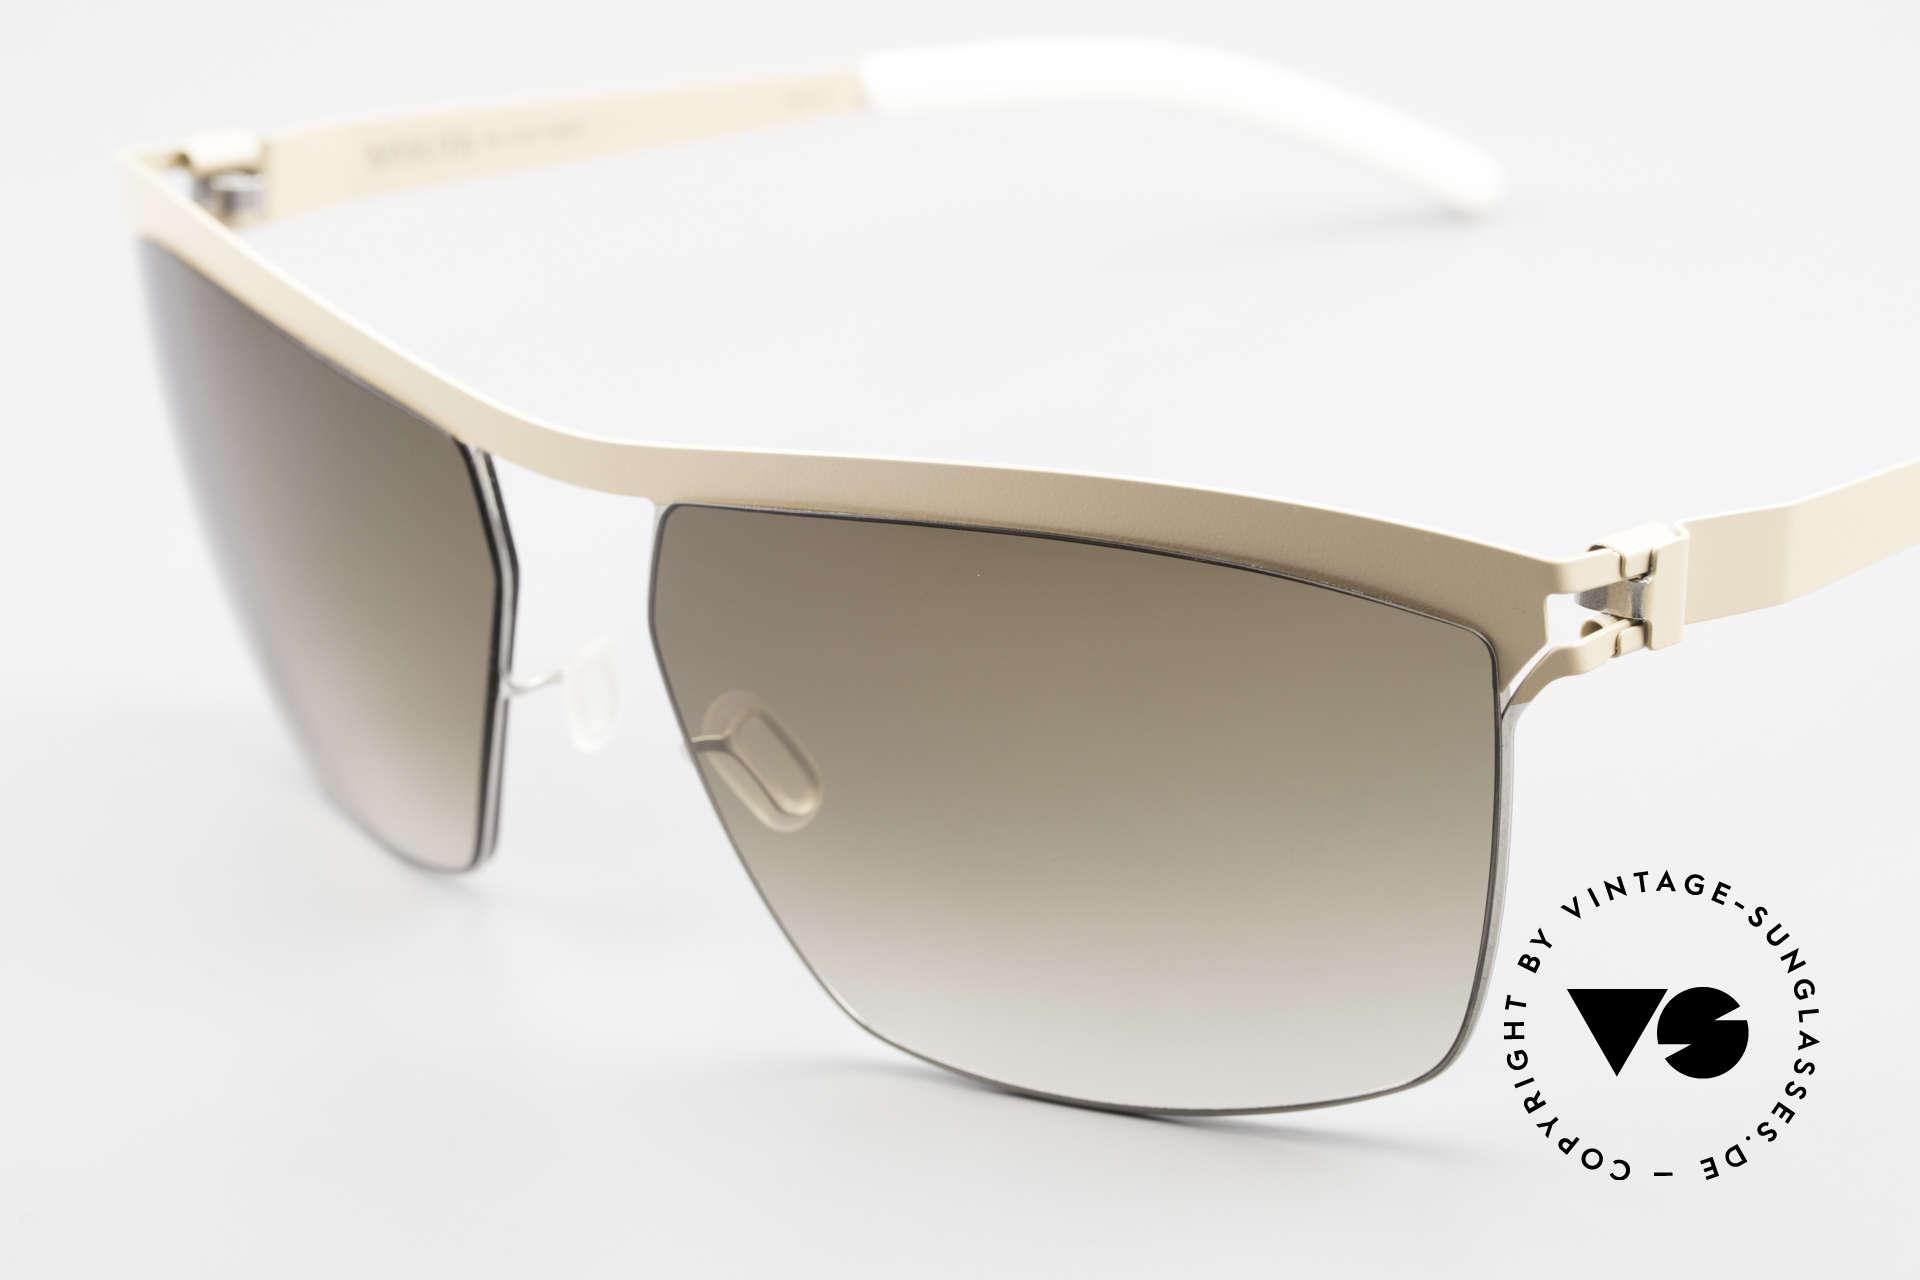 Mykita Tiago Designer Sunglasses Unisex, top-notch quality, made in Germany (Berlin-Kreuzberg), Made for Men and Women